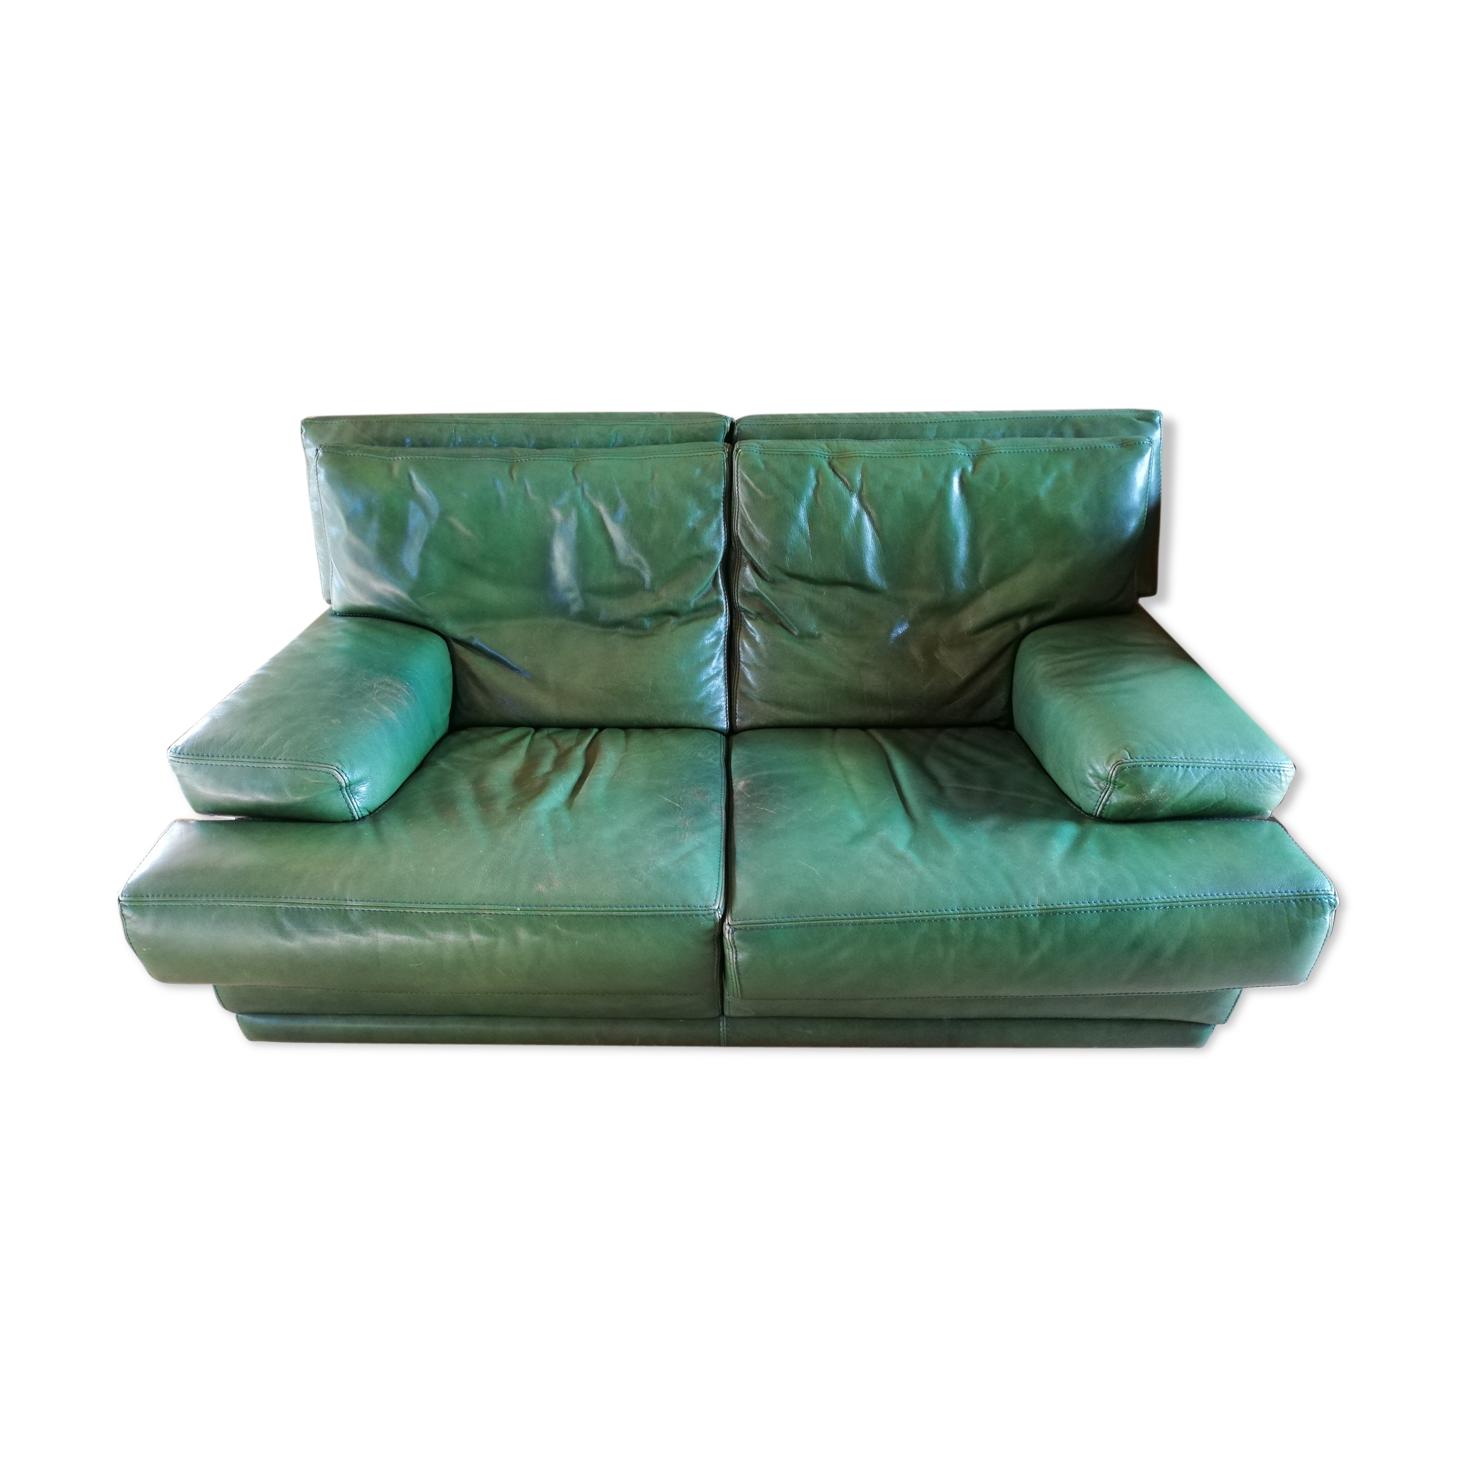 Canapé Roche Bobois cuir de buffle vert